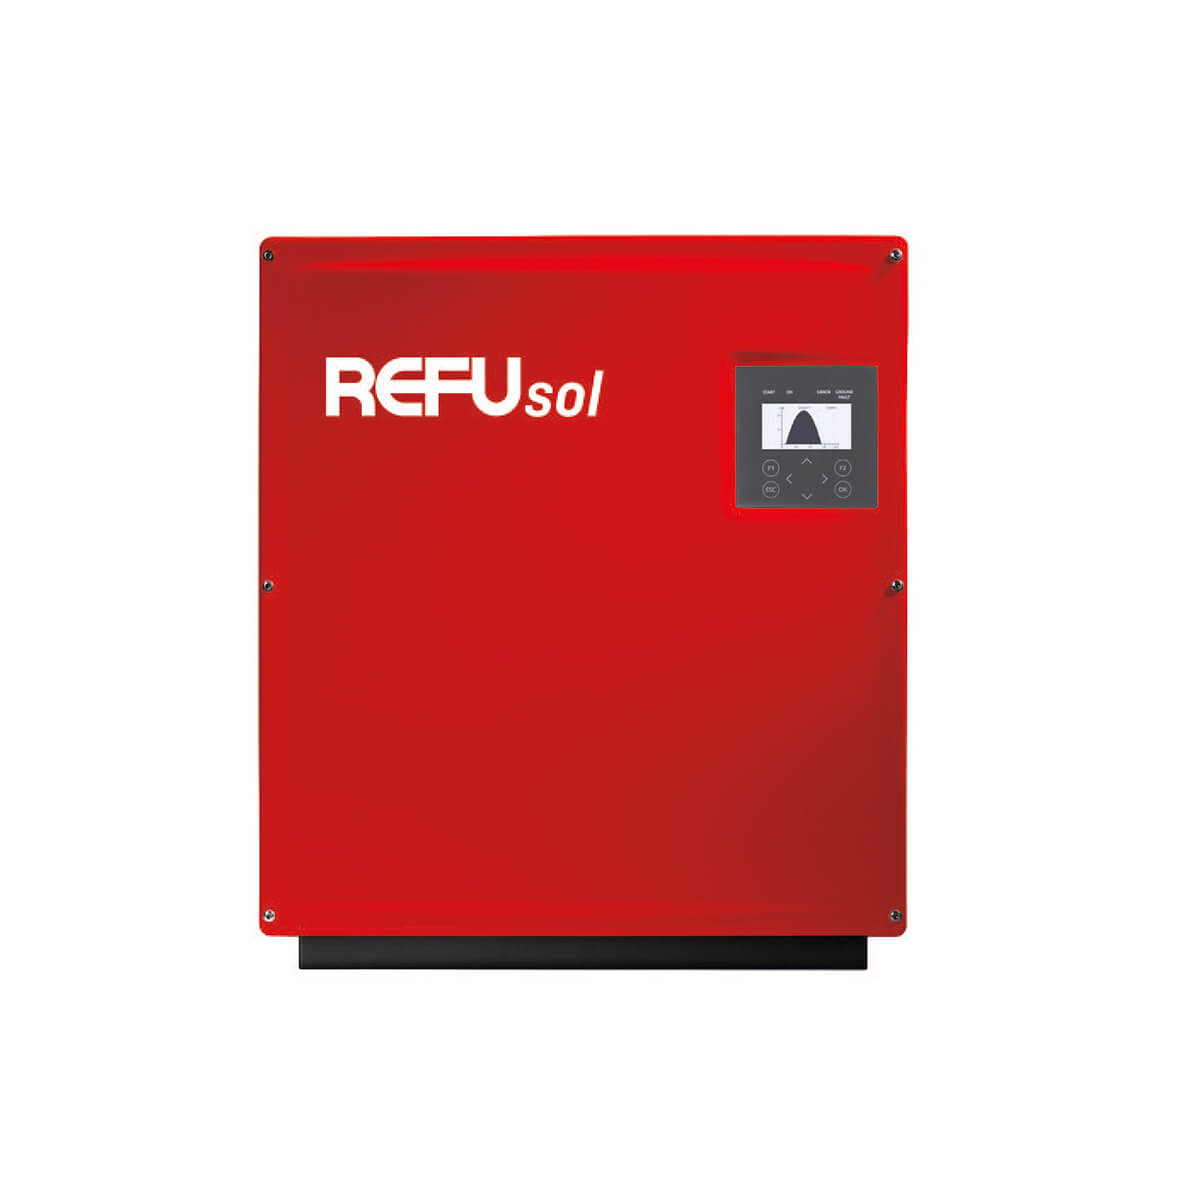 refusol 13kW inverter, refusol 13k 13kW inverter, refusol 13k inverter, refusol 13k, refusol 13k 13 kW